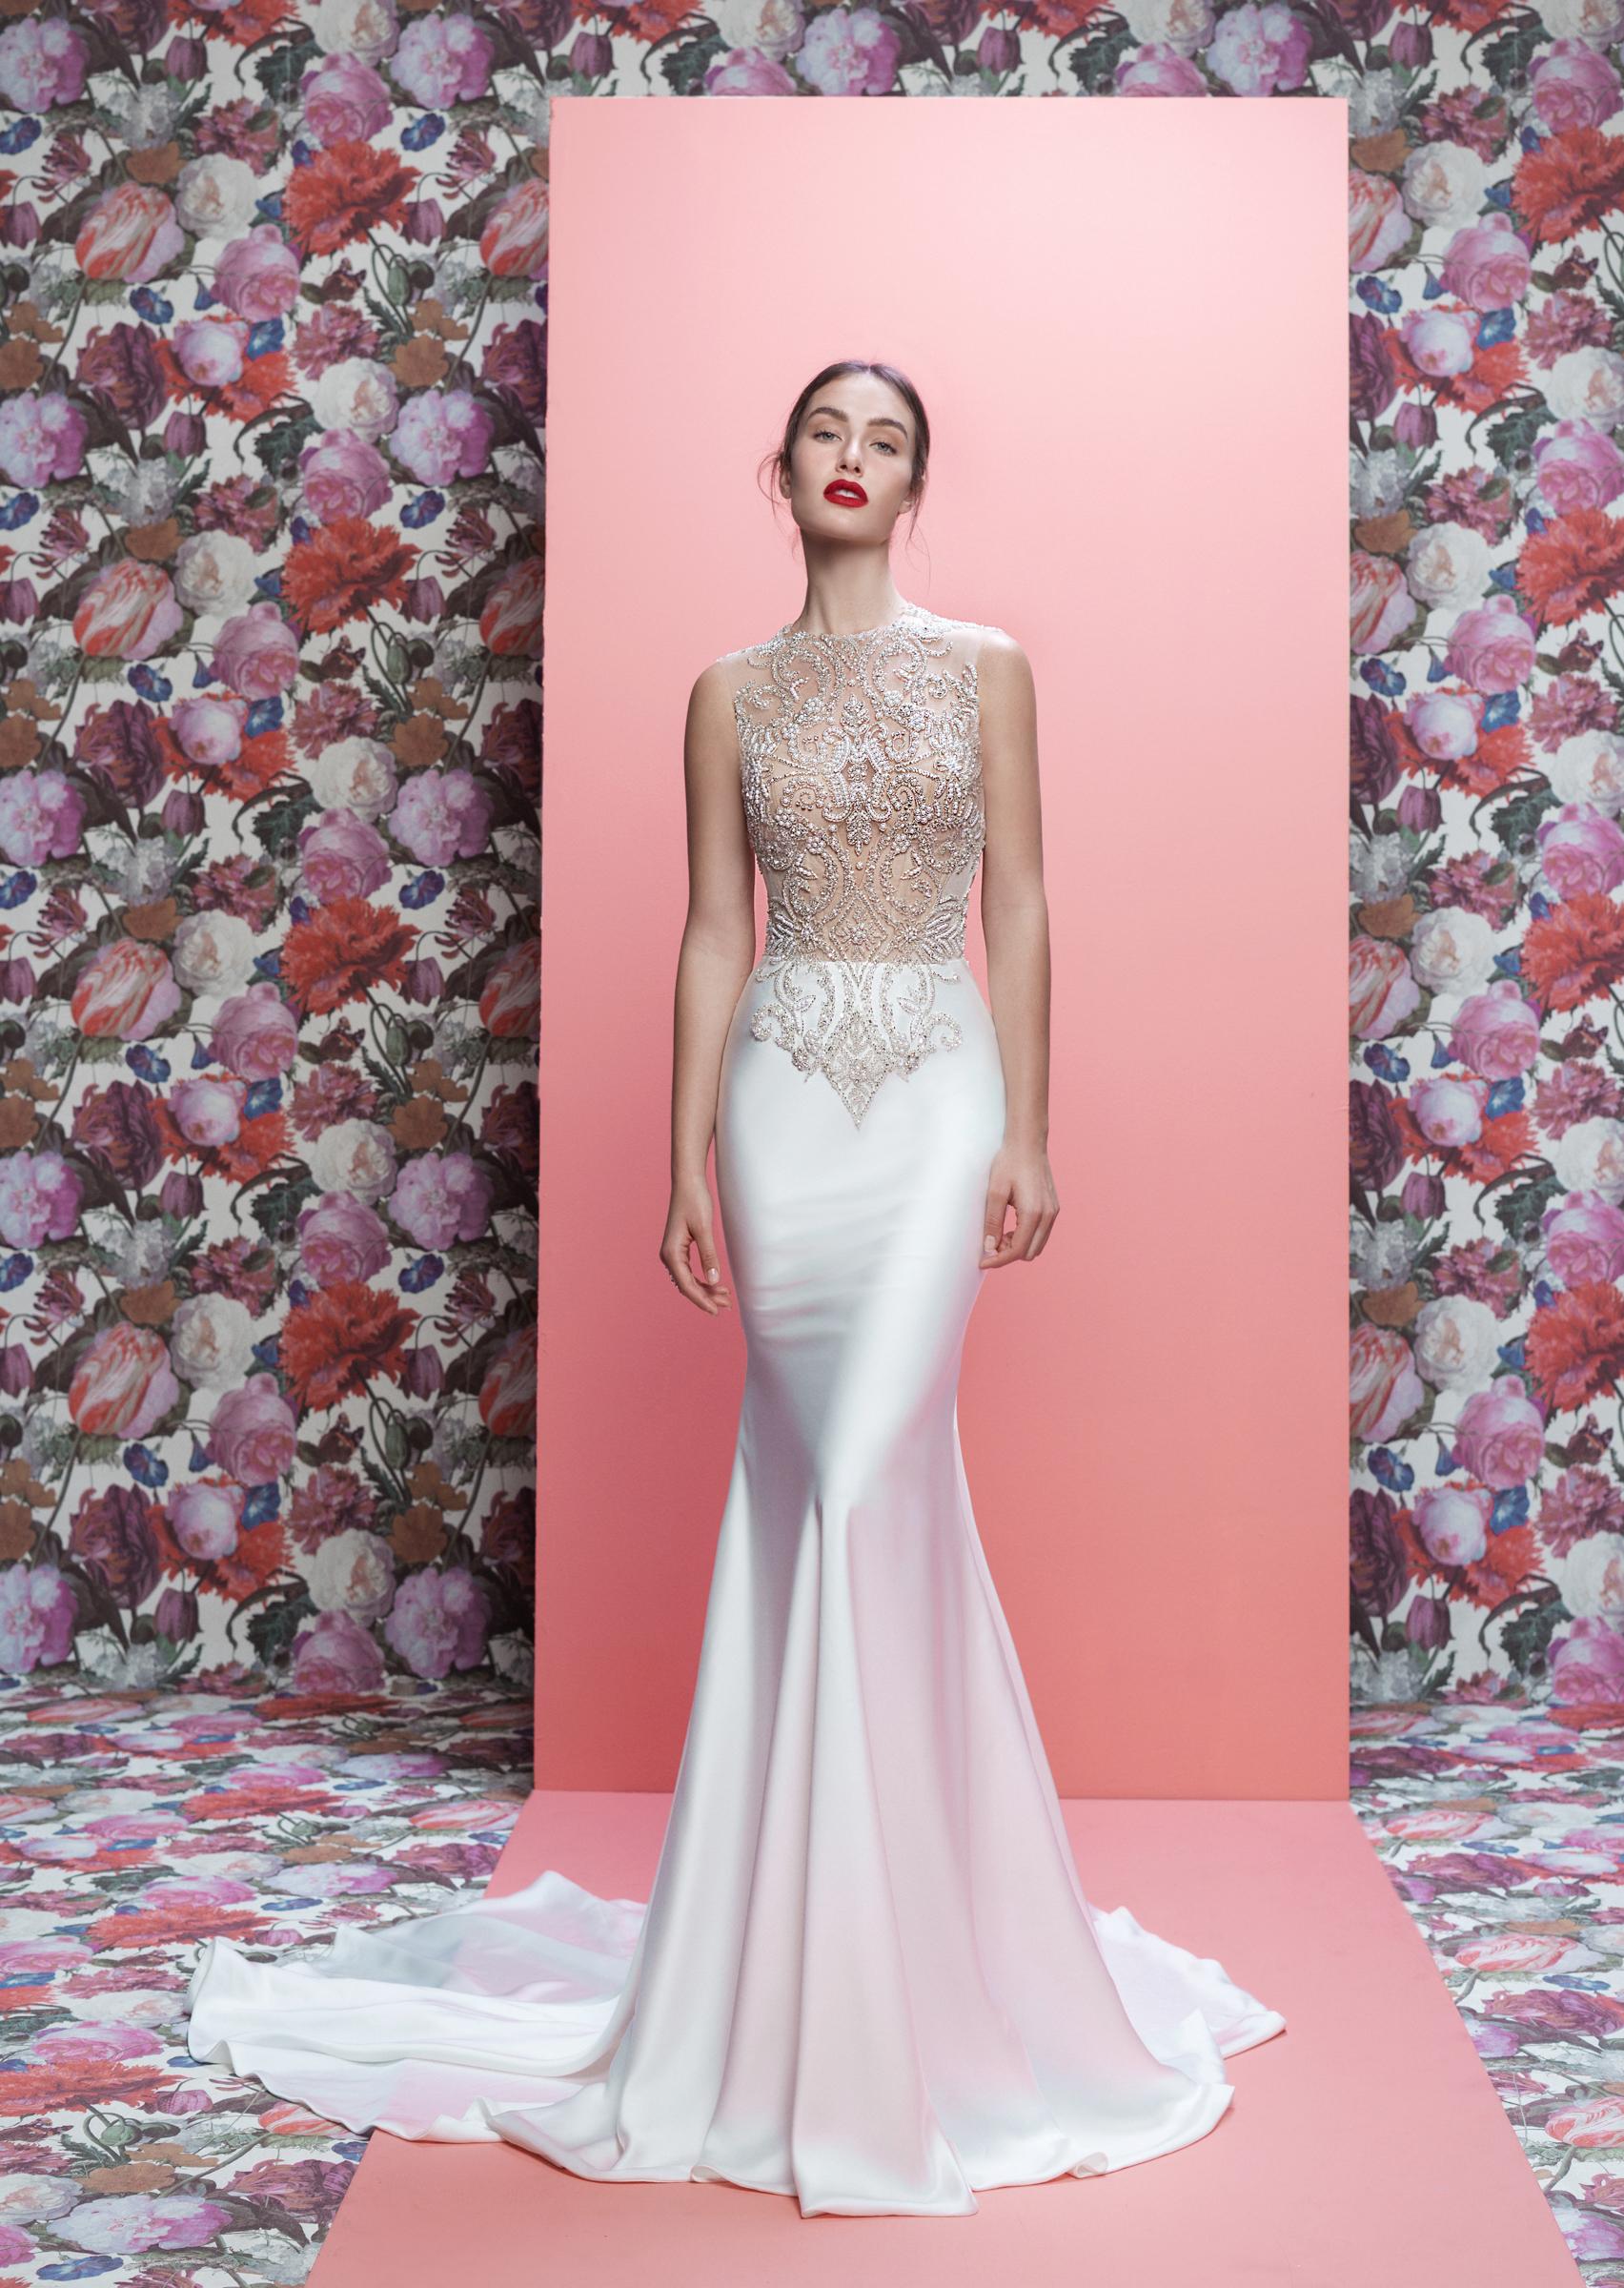 Galia Lahav wedding dress spring 2019 lace high neck satin trumpet